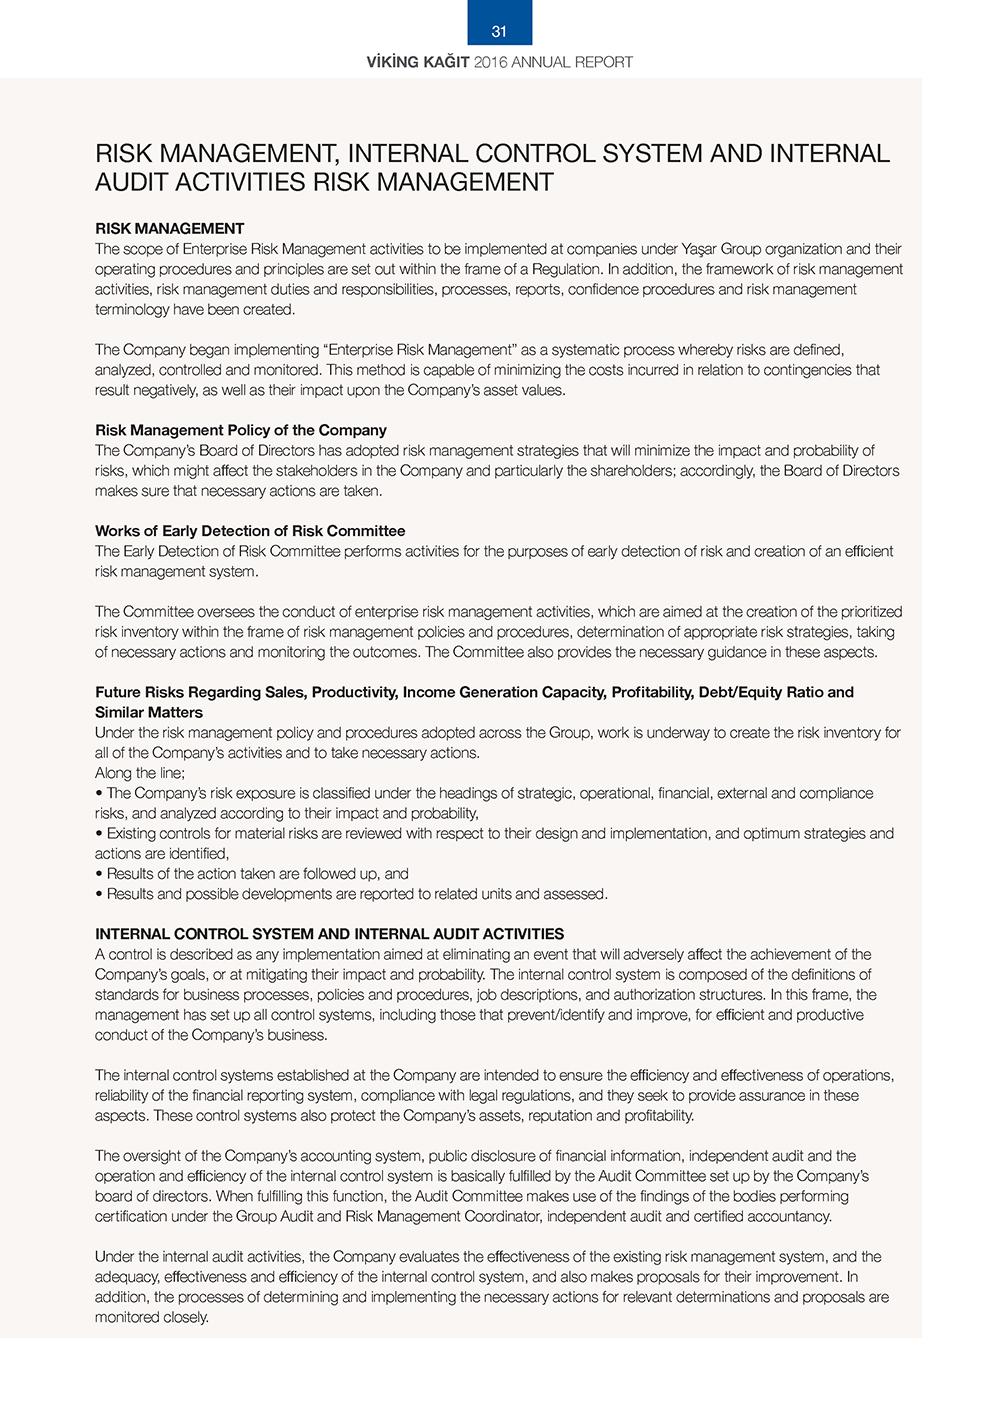 Risk Management, Internal Control System and Internal Audit